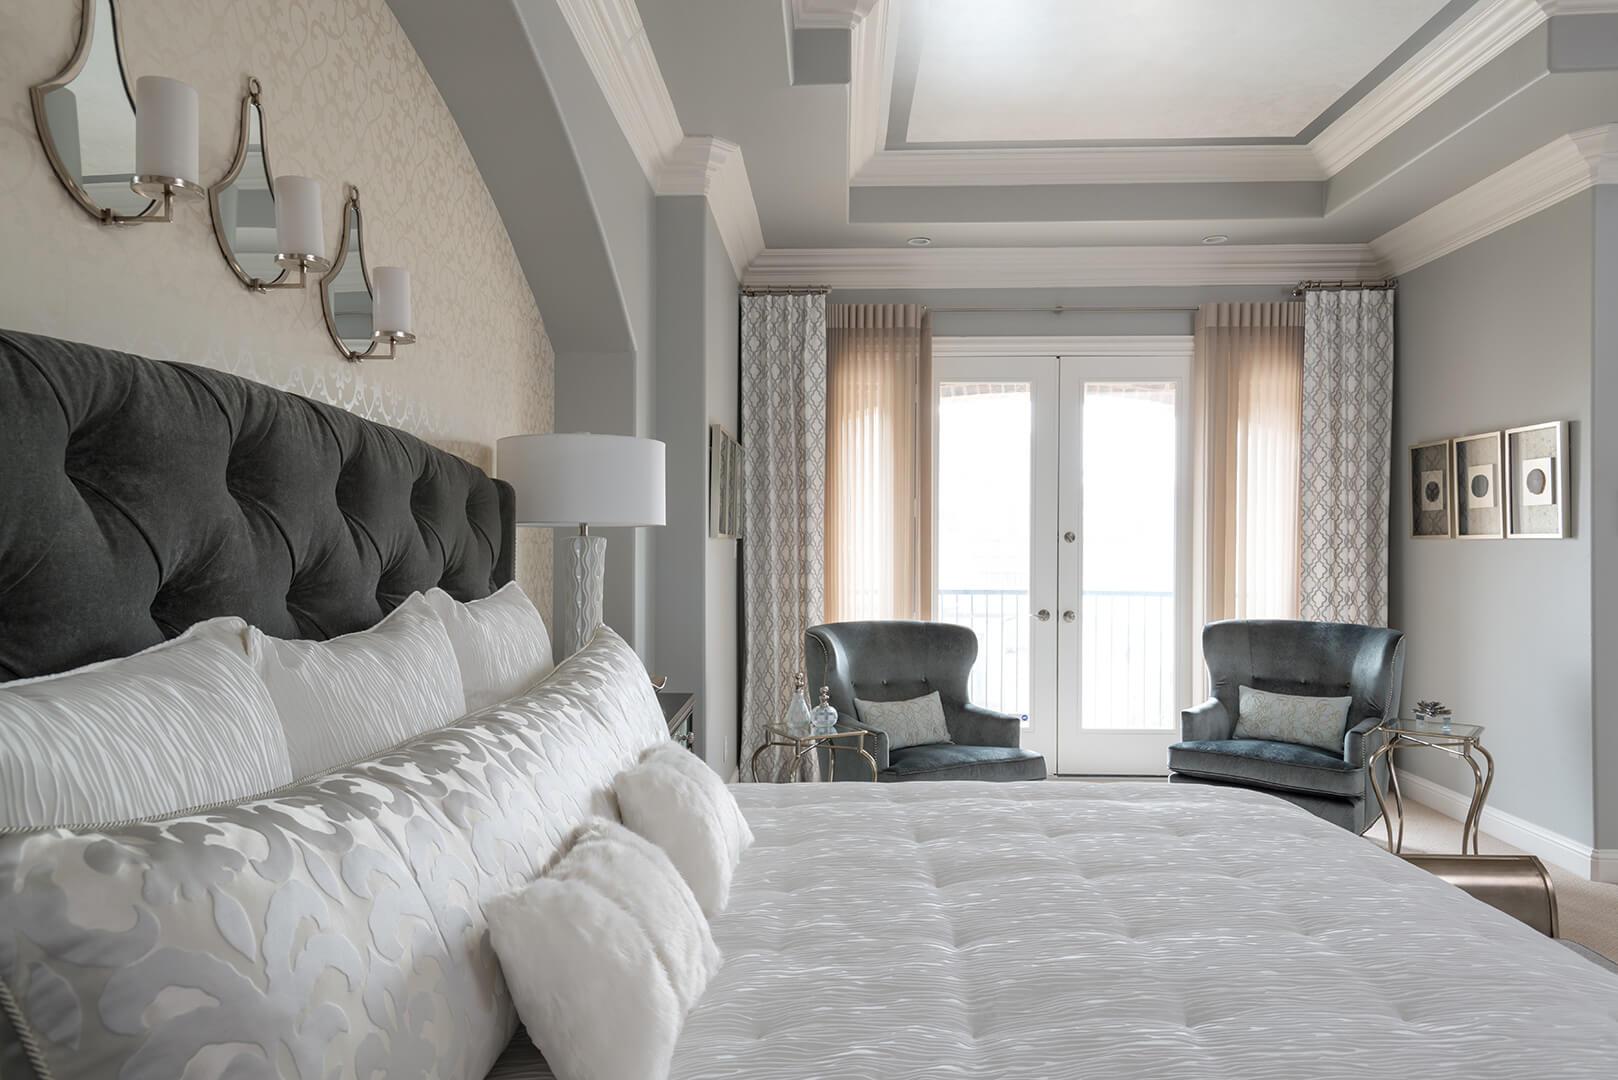 Gray & White Master Bedroom Decorating Ideas by Dee Frazier Interiors Decorating Den Interiors the best Dallas Interior Designer